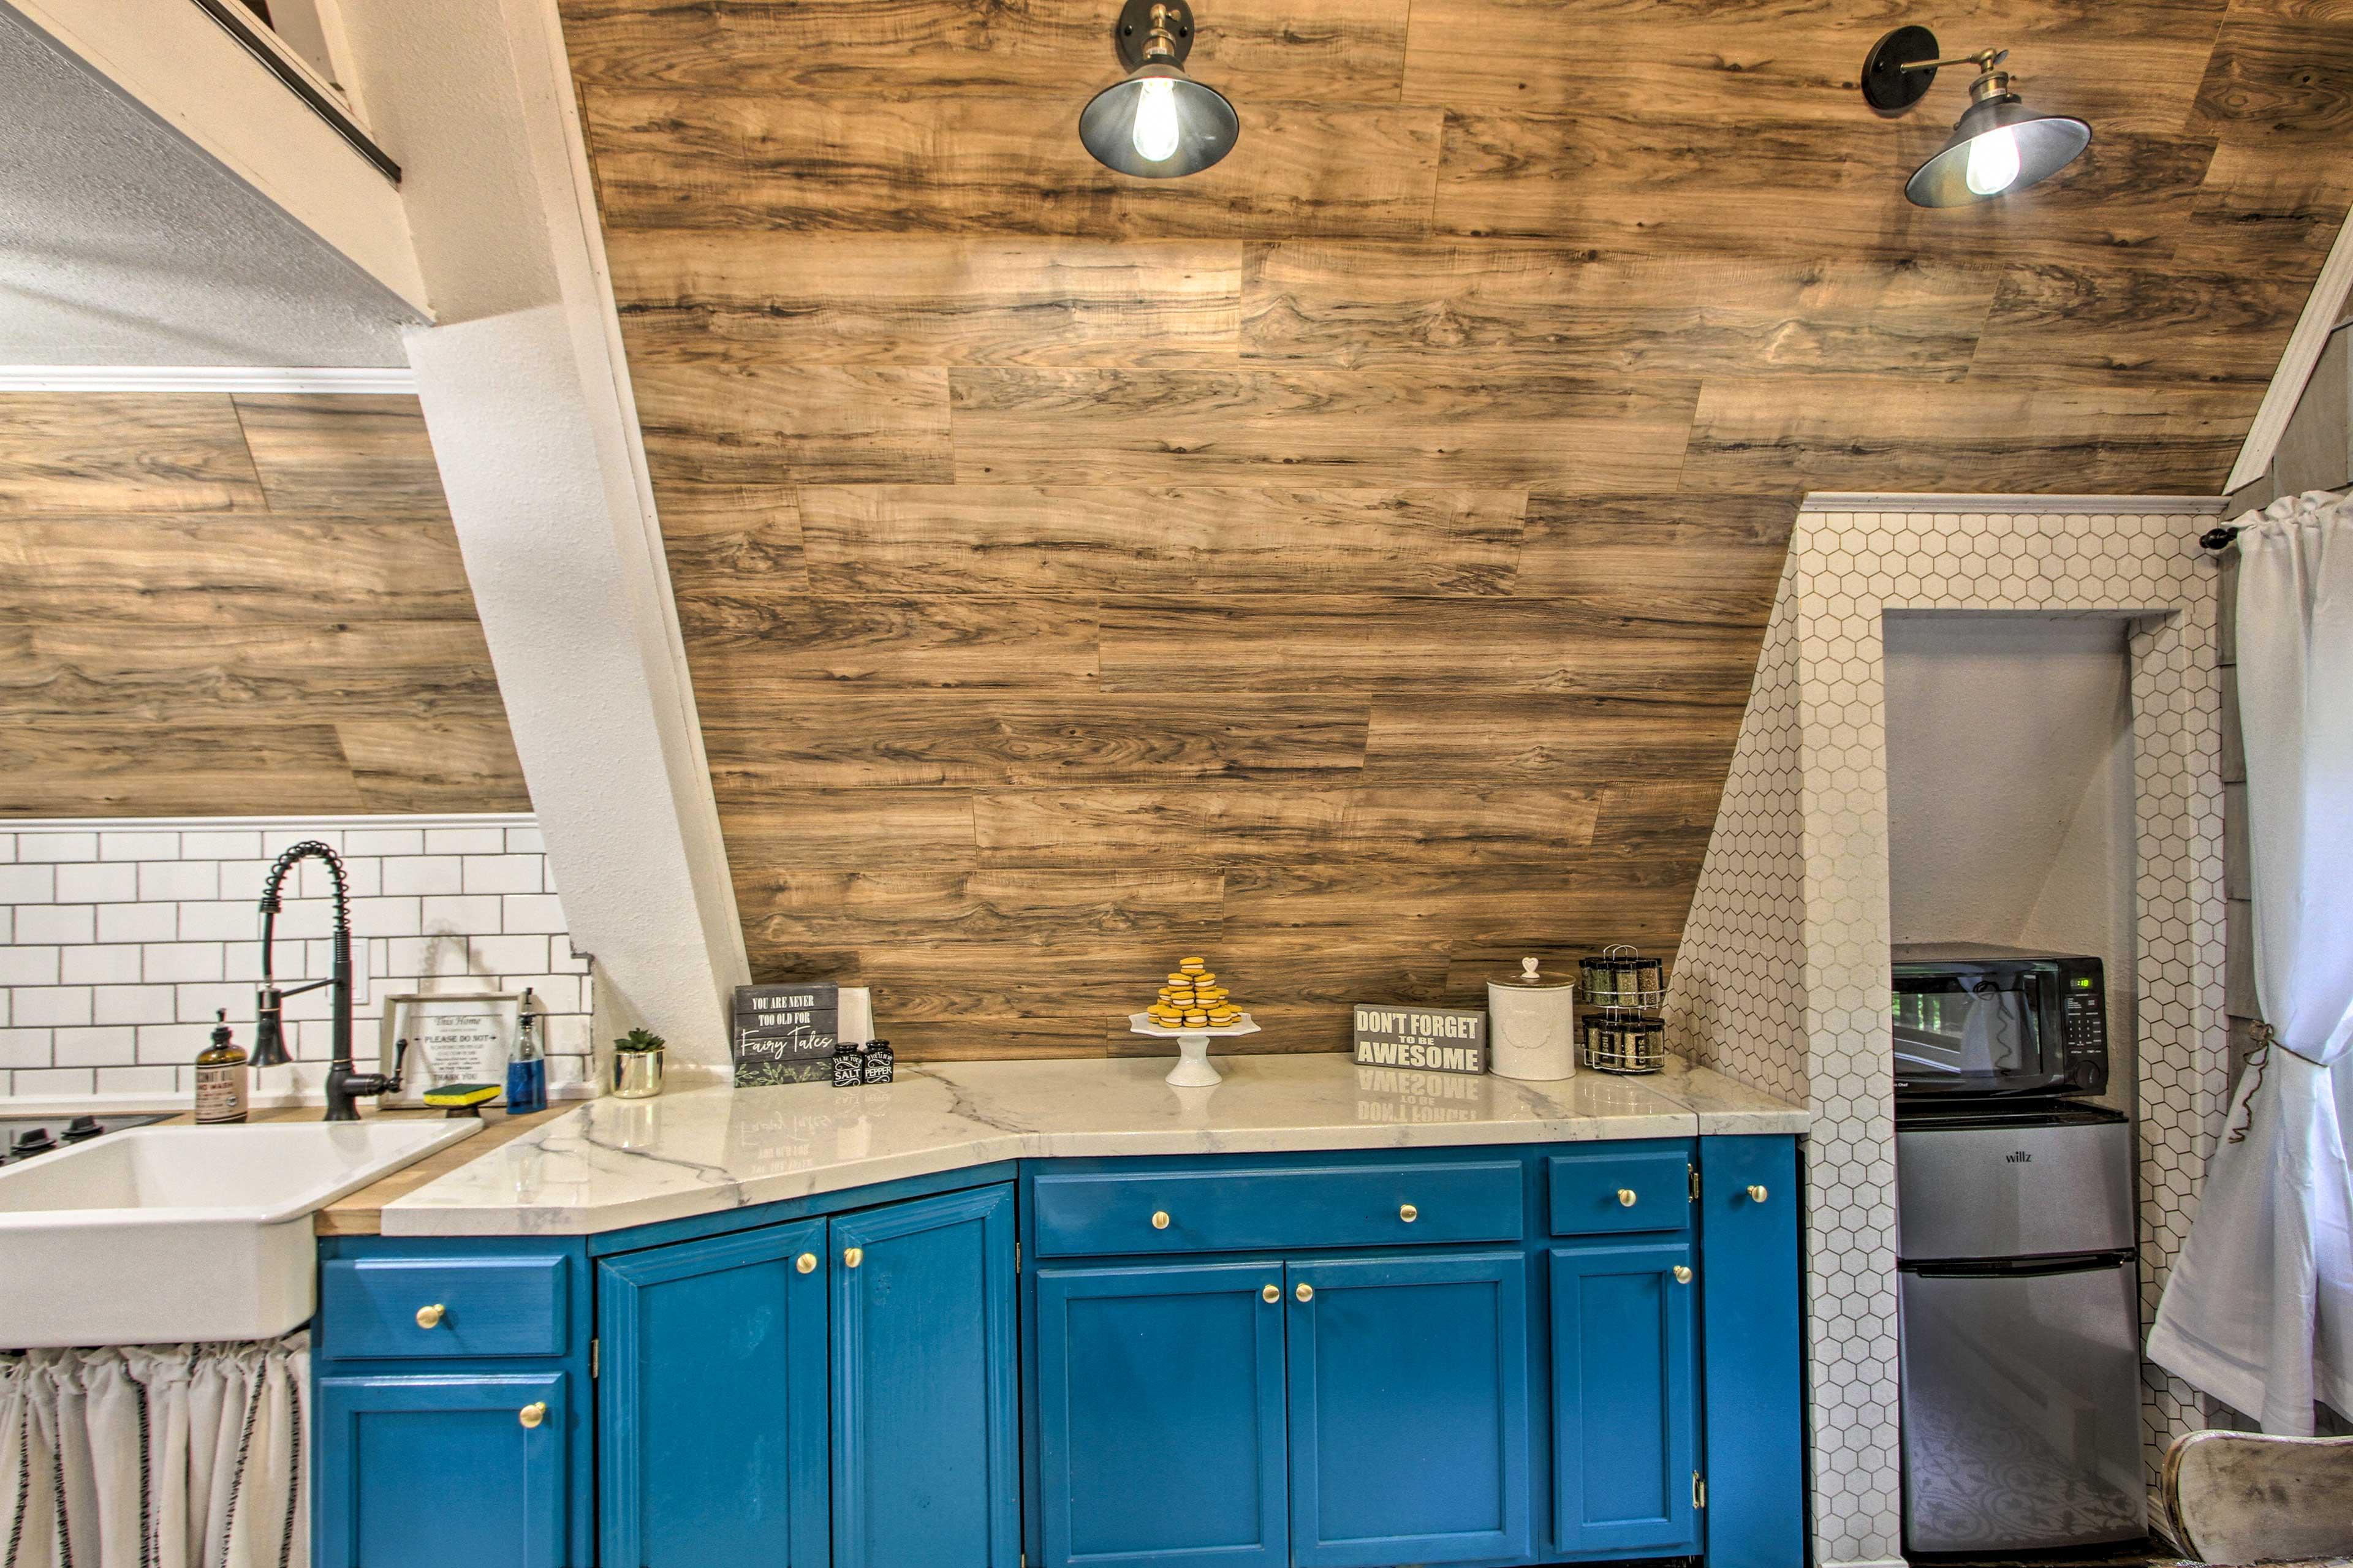 The kitchen also includes a stove/oven, farmhouse sink, microwave, & mini-fridge